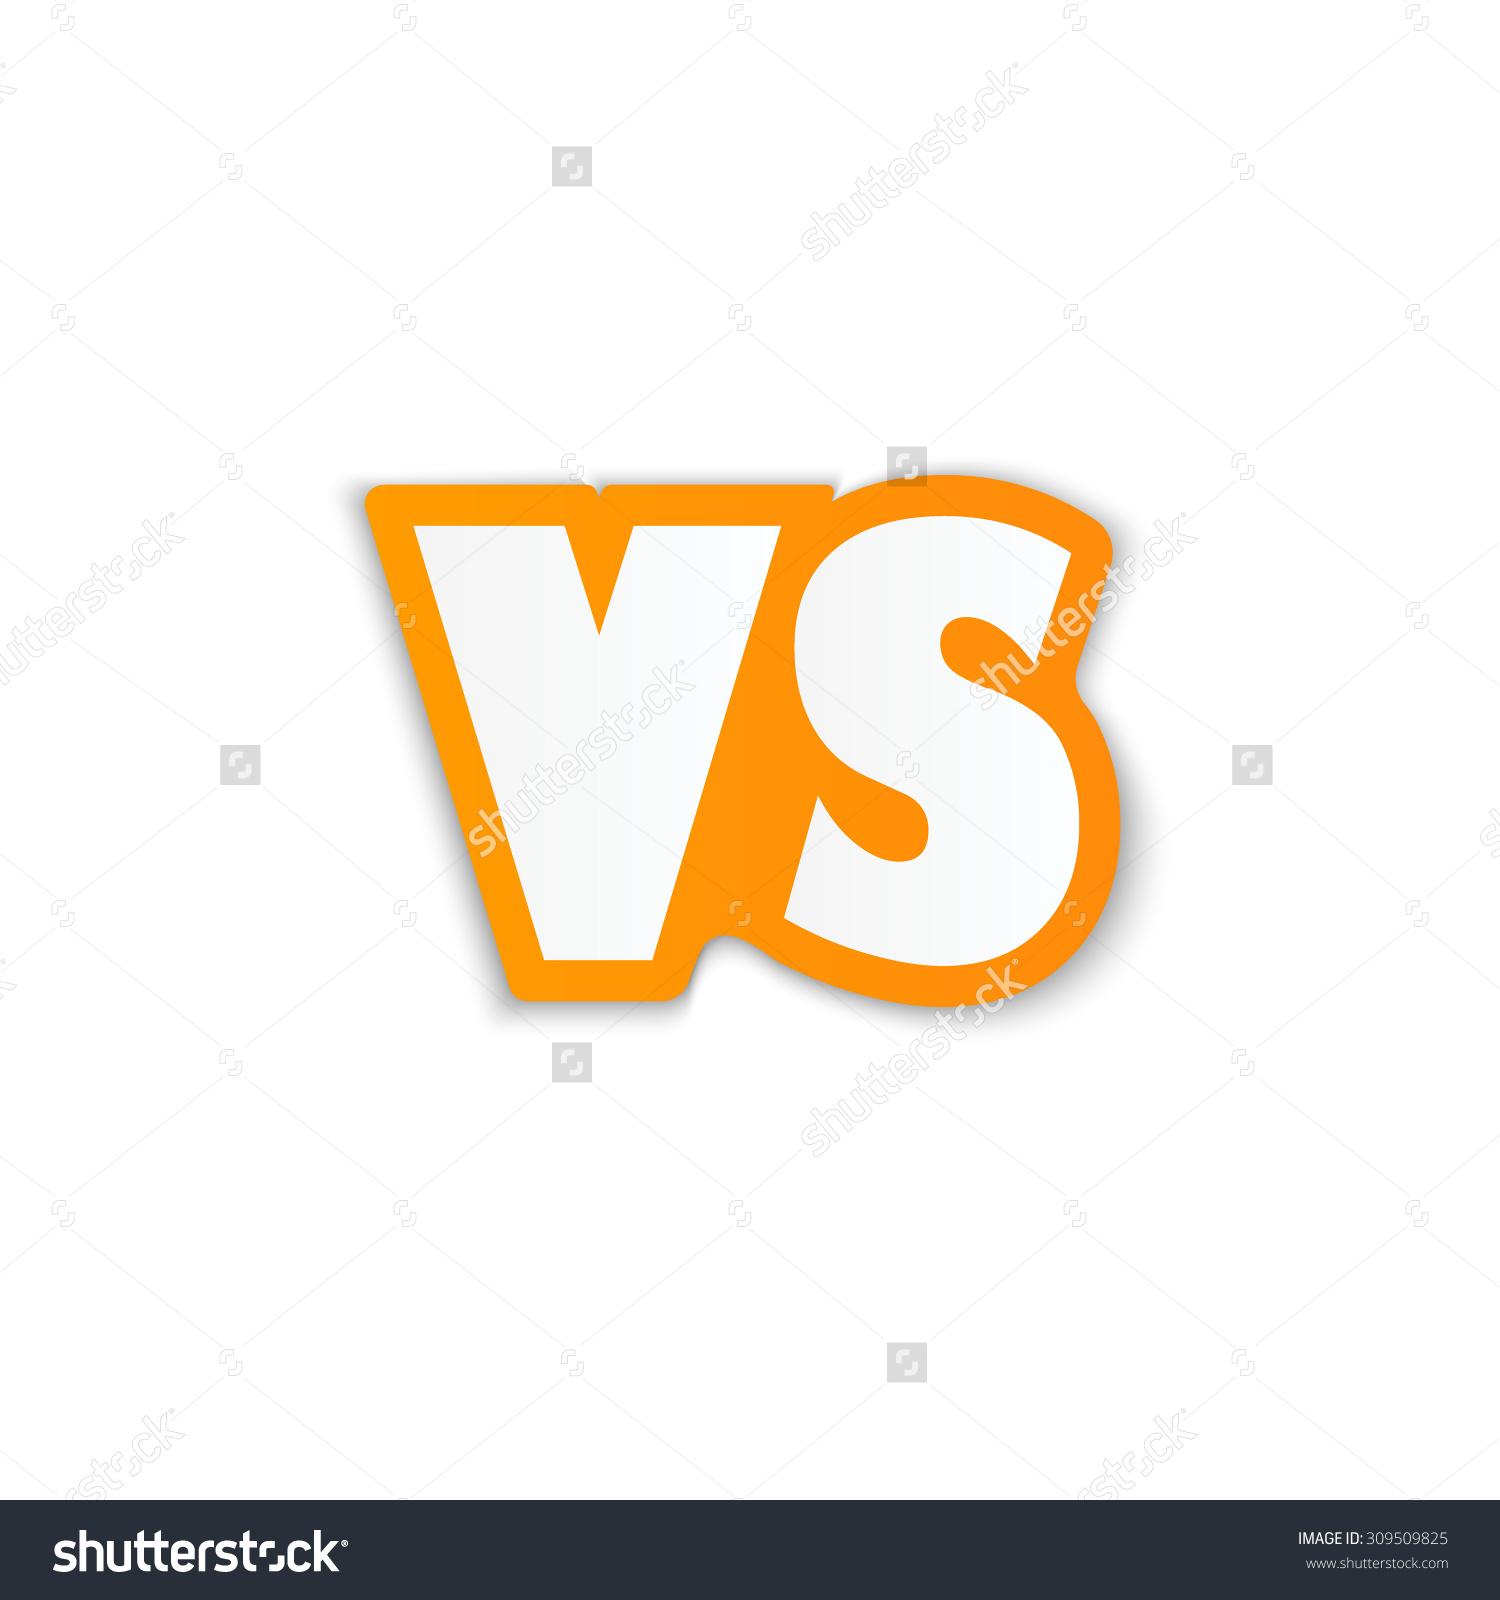 Versus Clipart Clipground